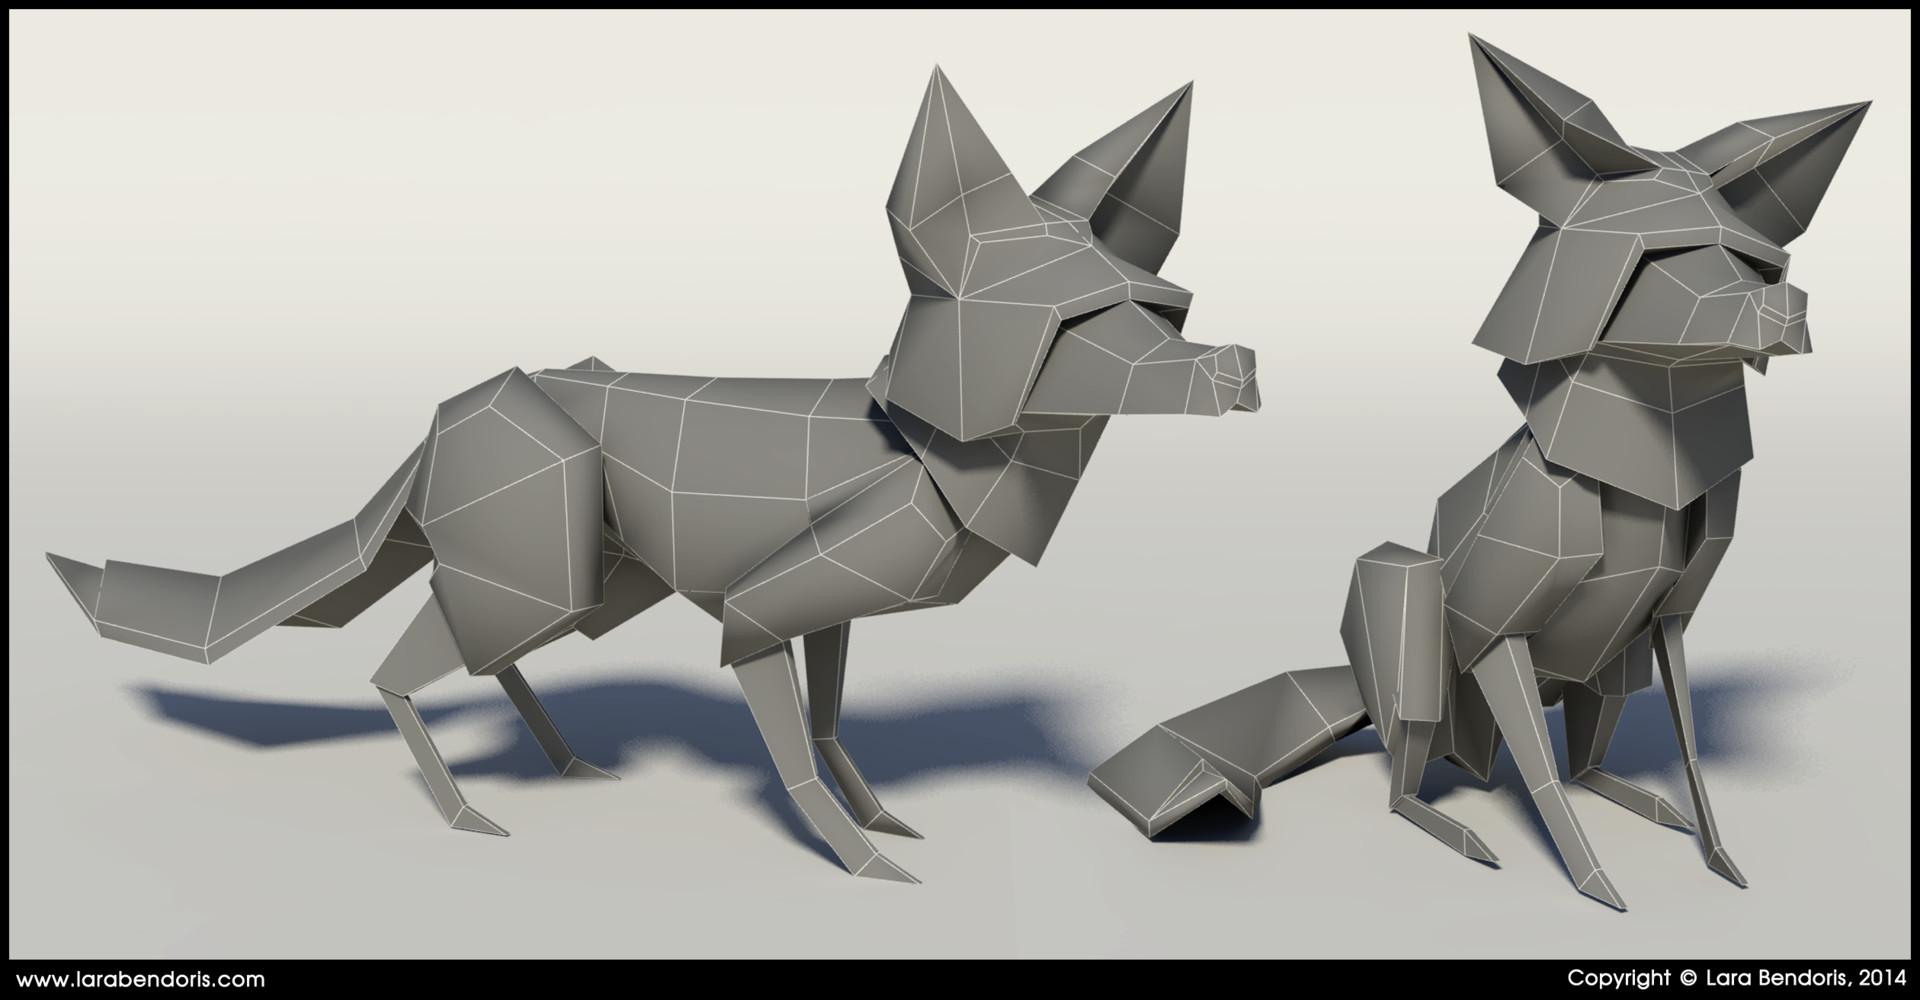 Lara bendoris fox3